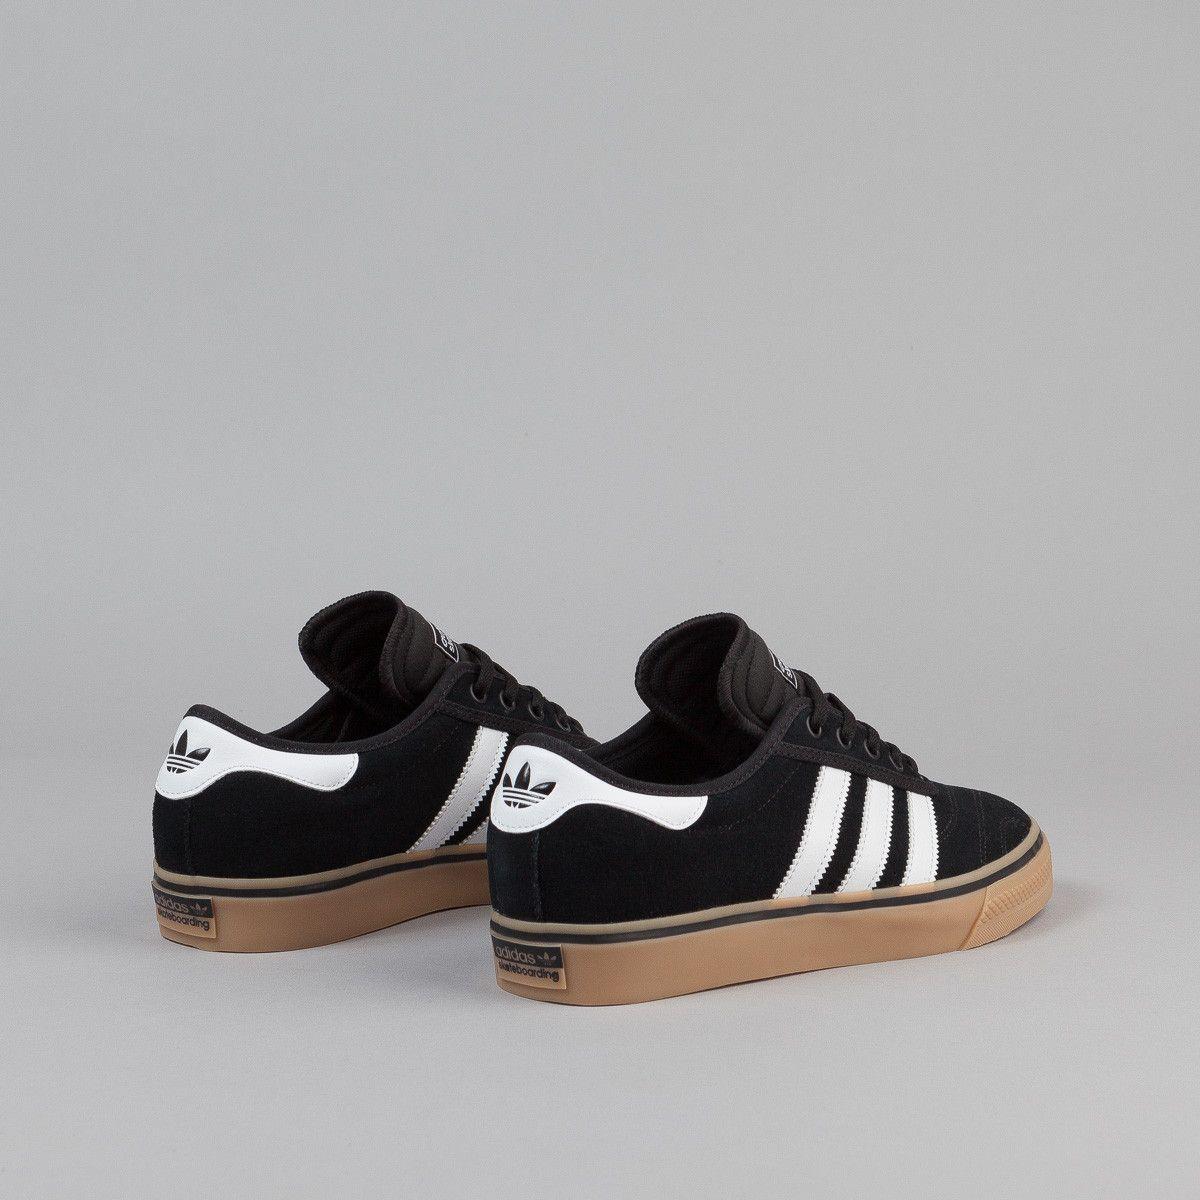 Adidas dga - premier scarpe nucleo nero ftw white gomma da masticare (1200